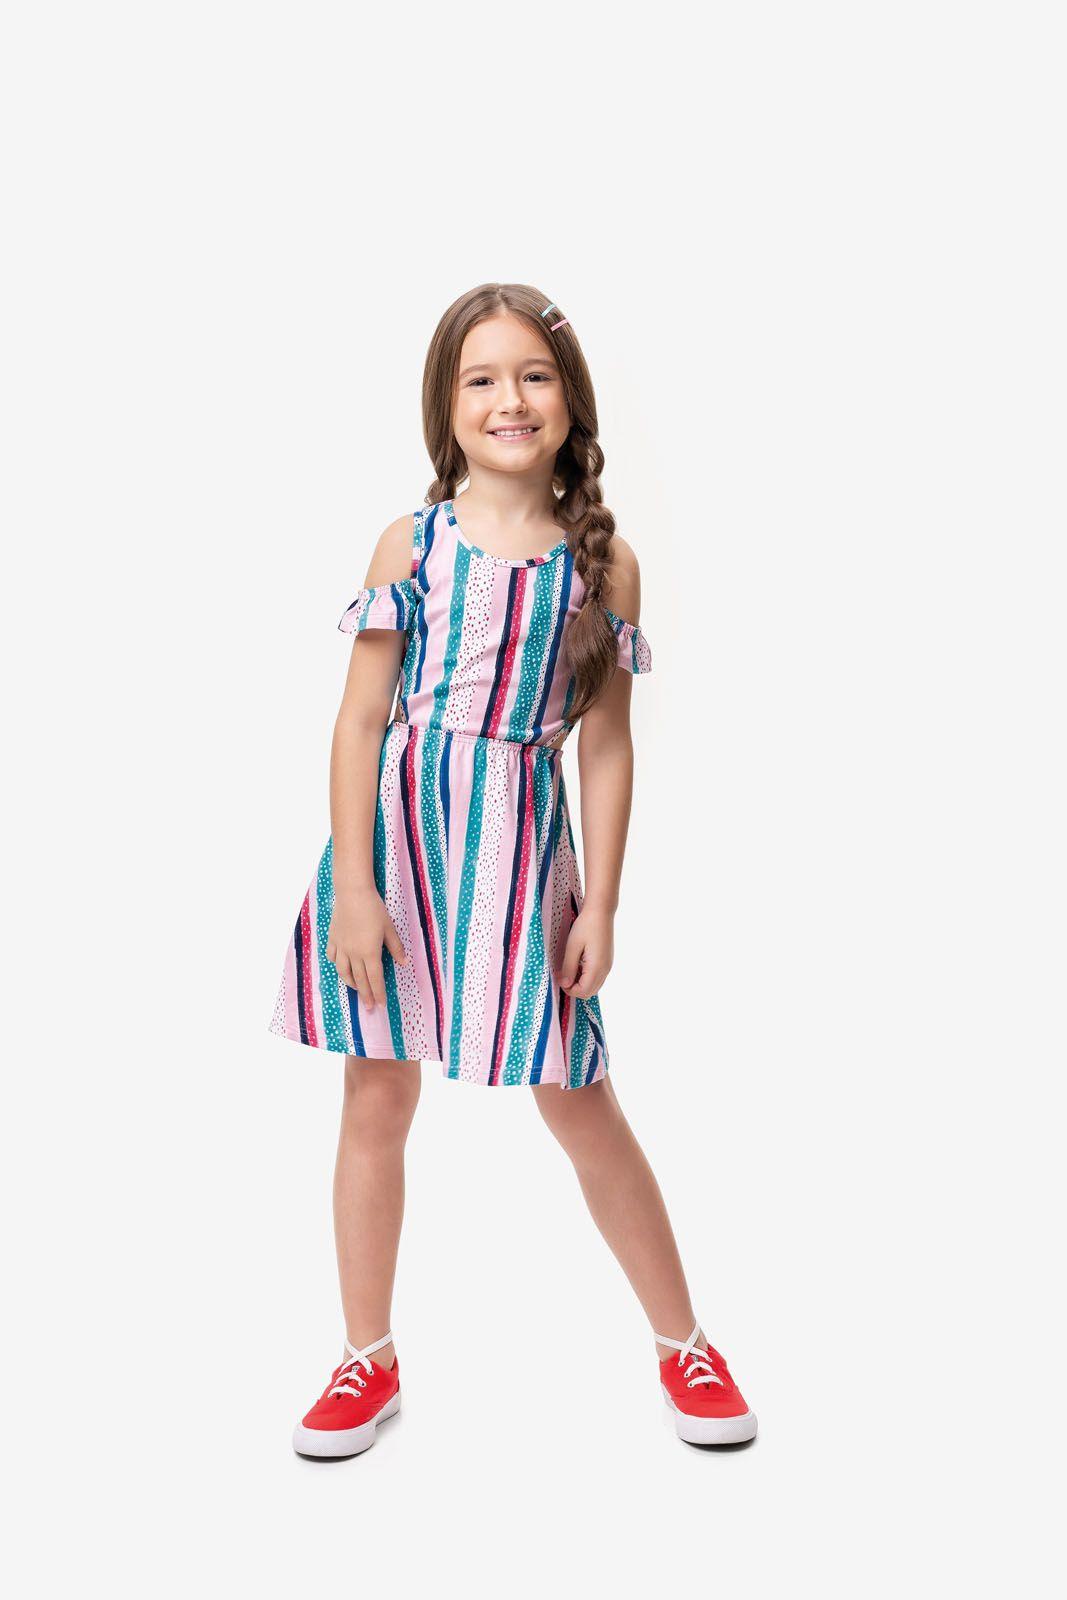 Vestido Infantil Feminina Verão Rosa Listras Malwee